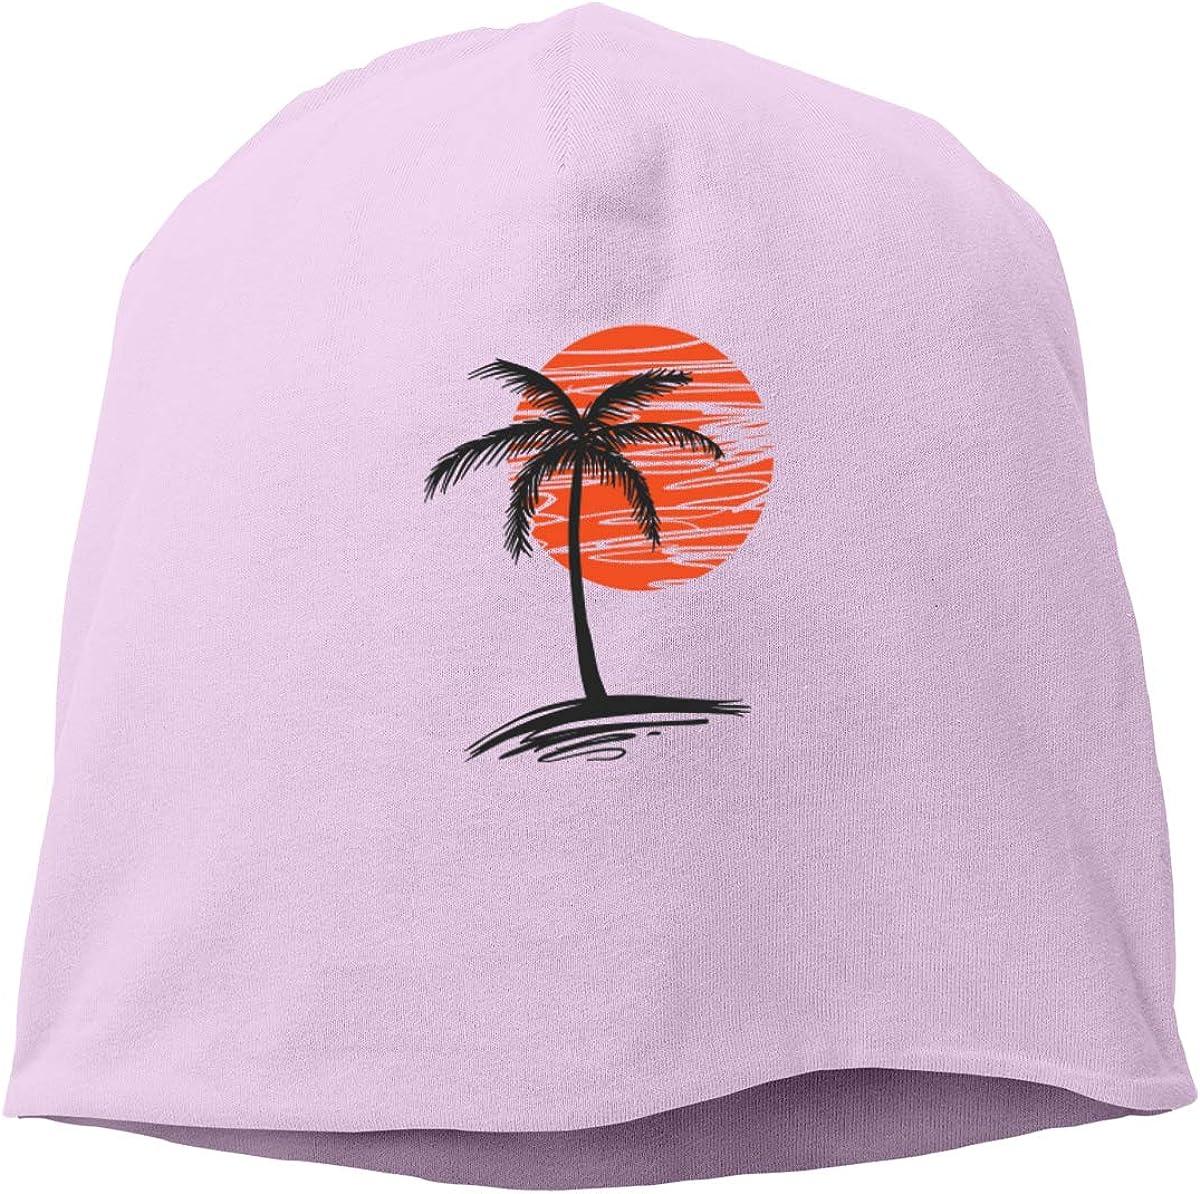 Palm Tree Sunset Skull Cap Helmet Liner Beanie Cap for Men Hip Hop Hedging Head Hat